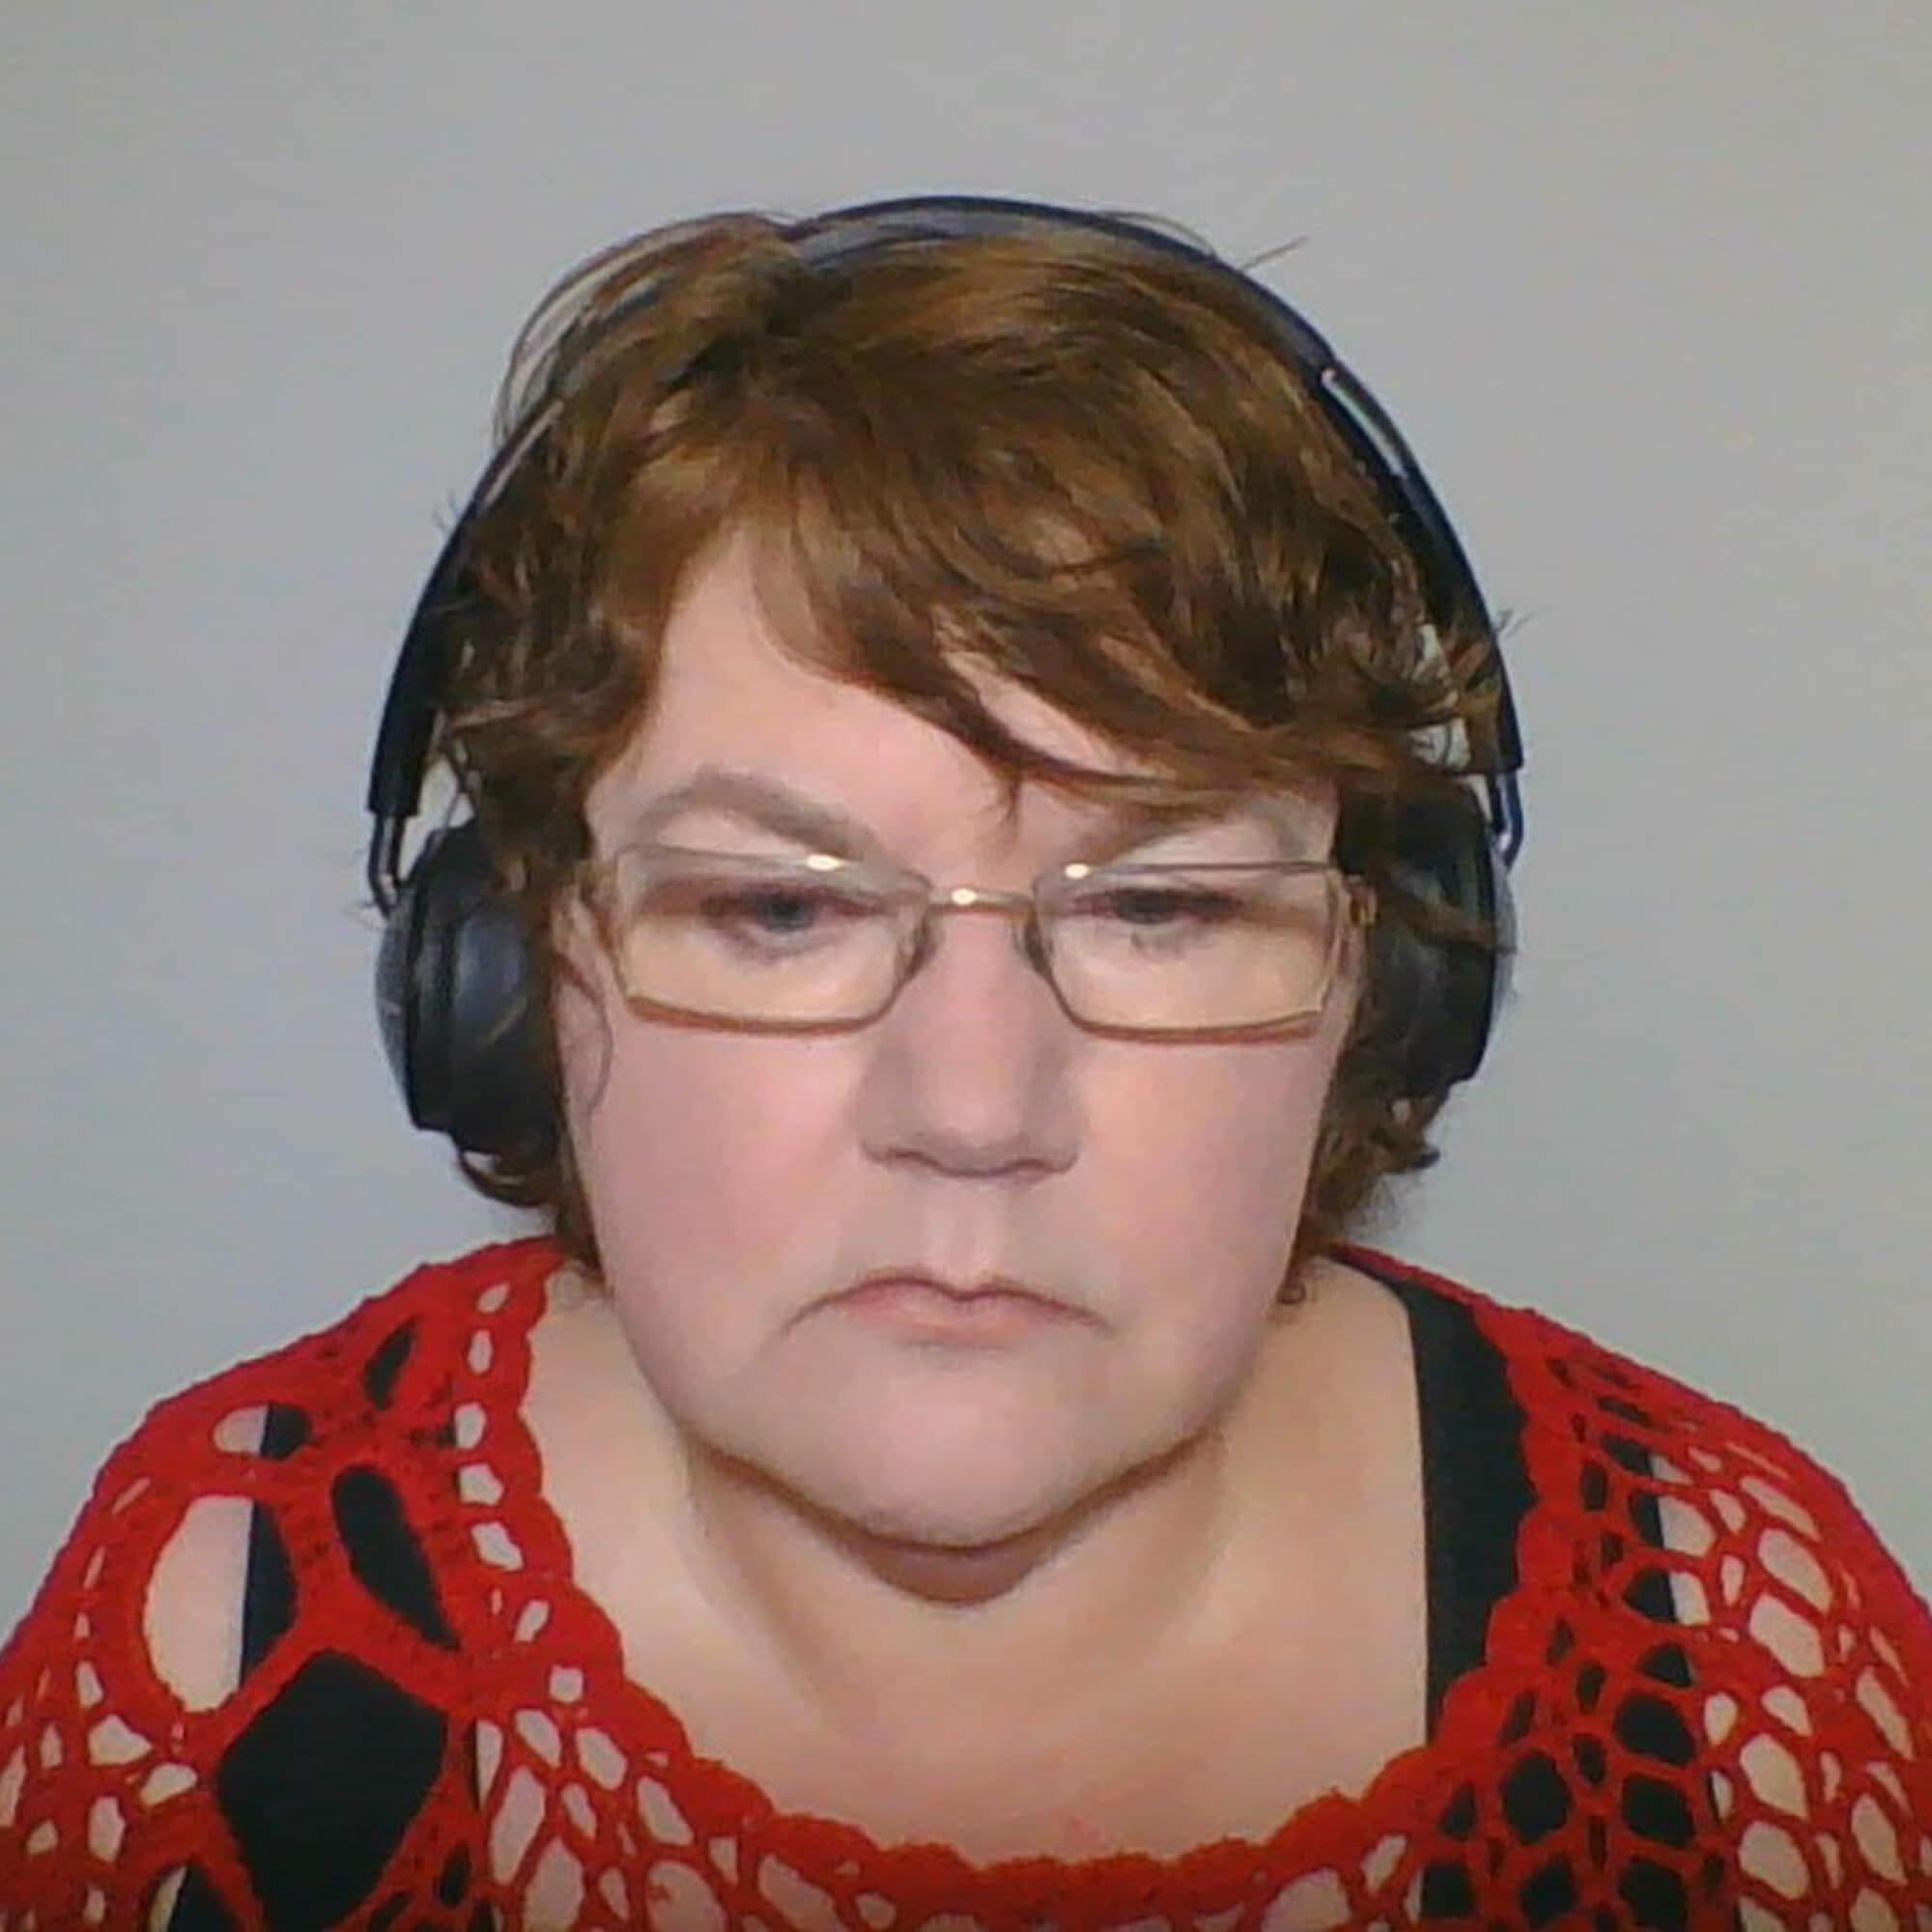 Veronika wearing headphones and glasses, sitting.